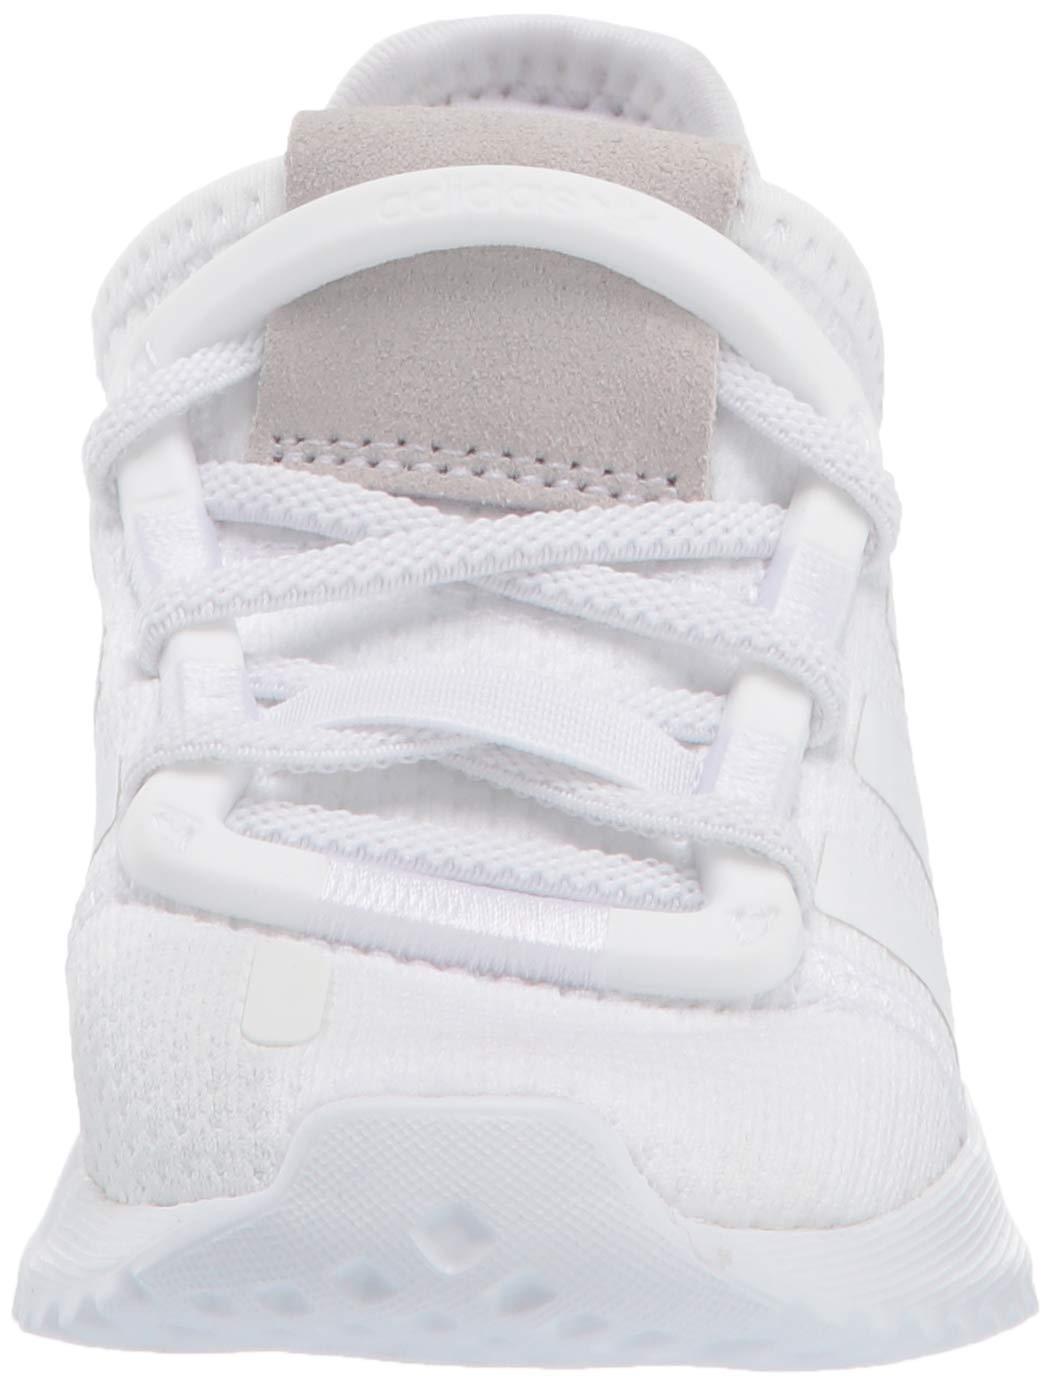 adidas Originals Baby U_Path Running Shoe White, 5.5K M US Toddler by adidas Originals (Image #4)